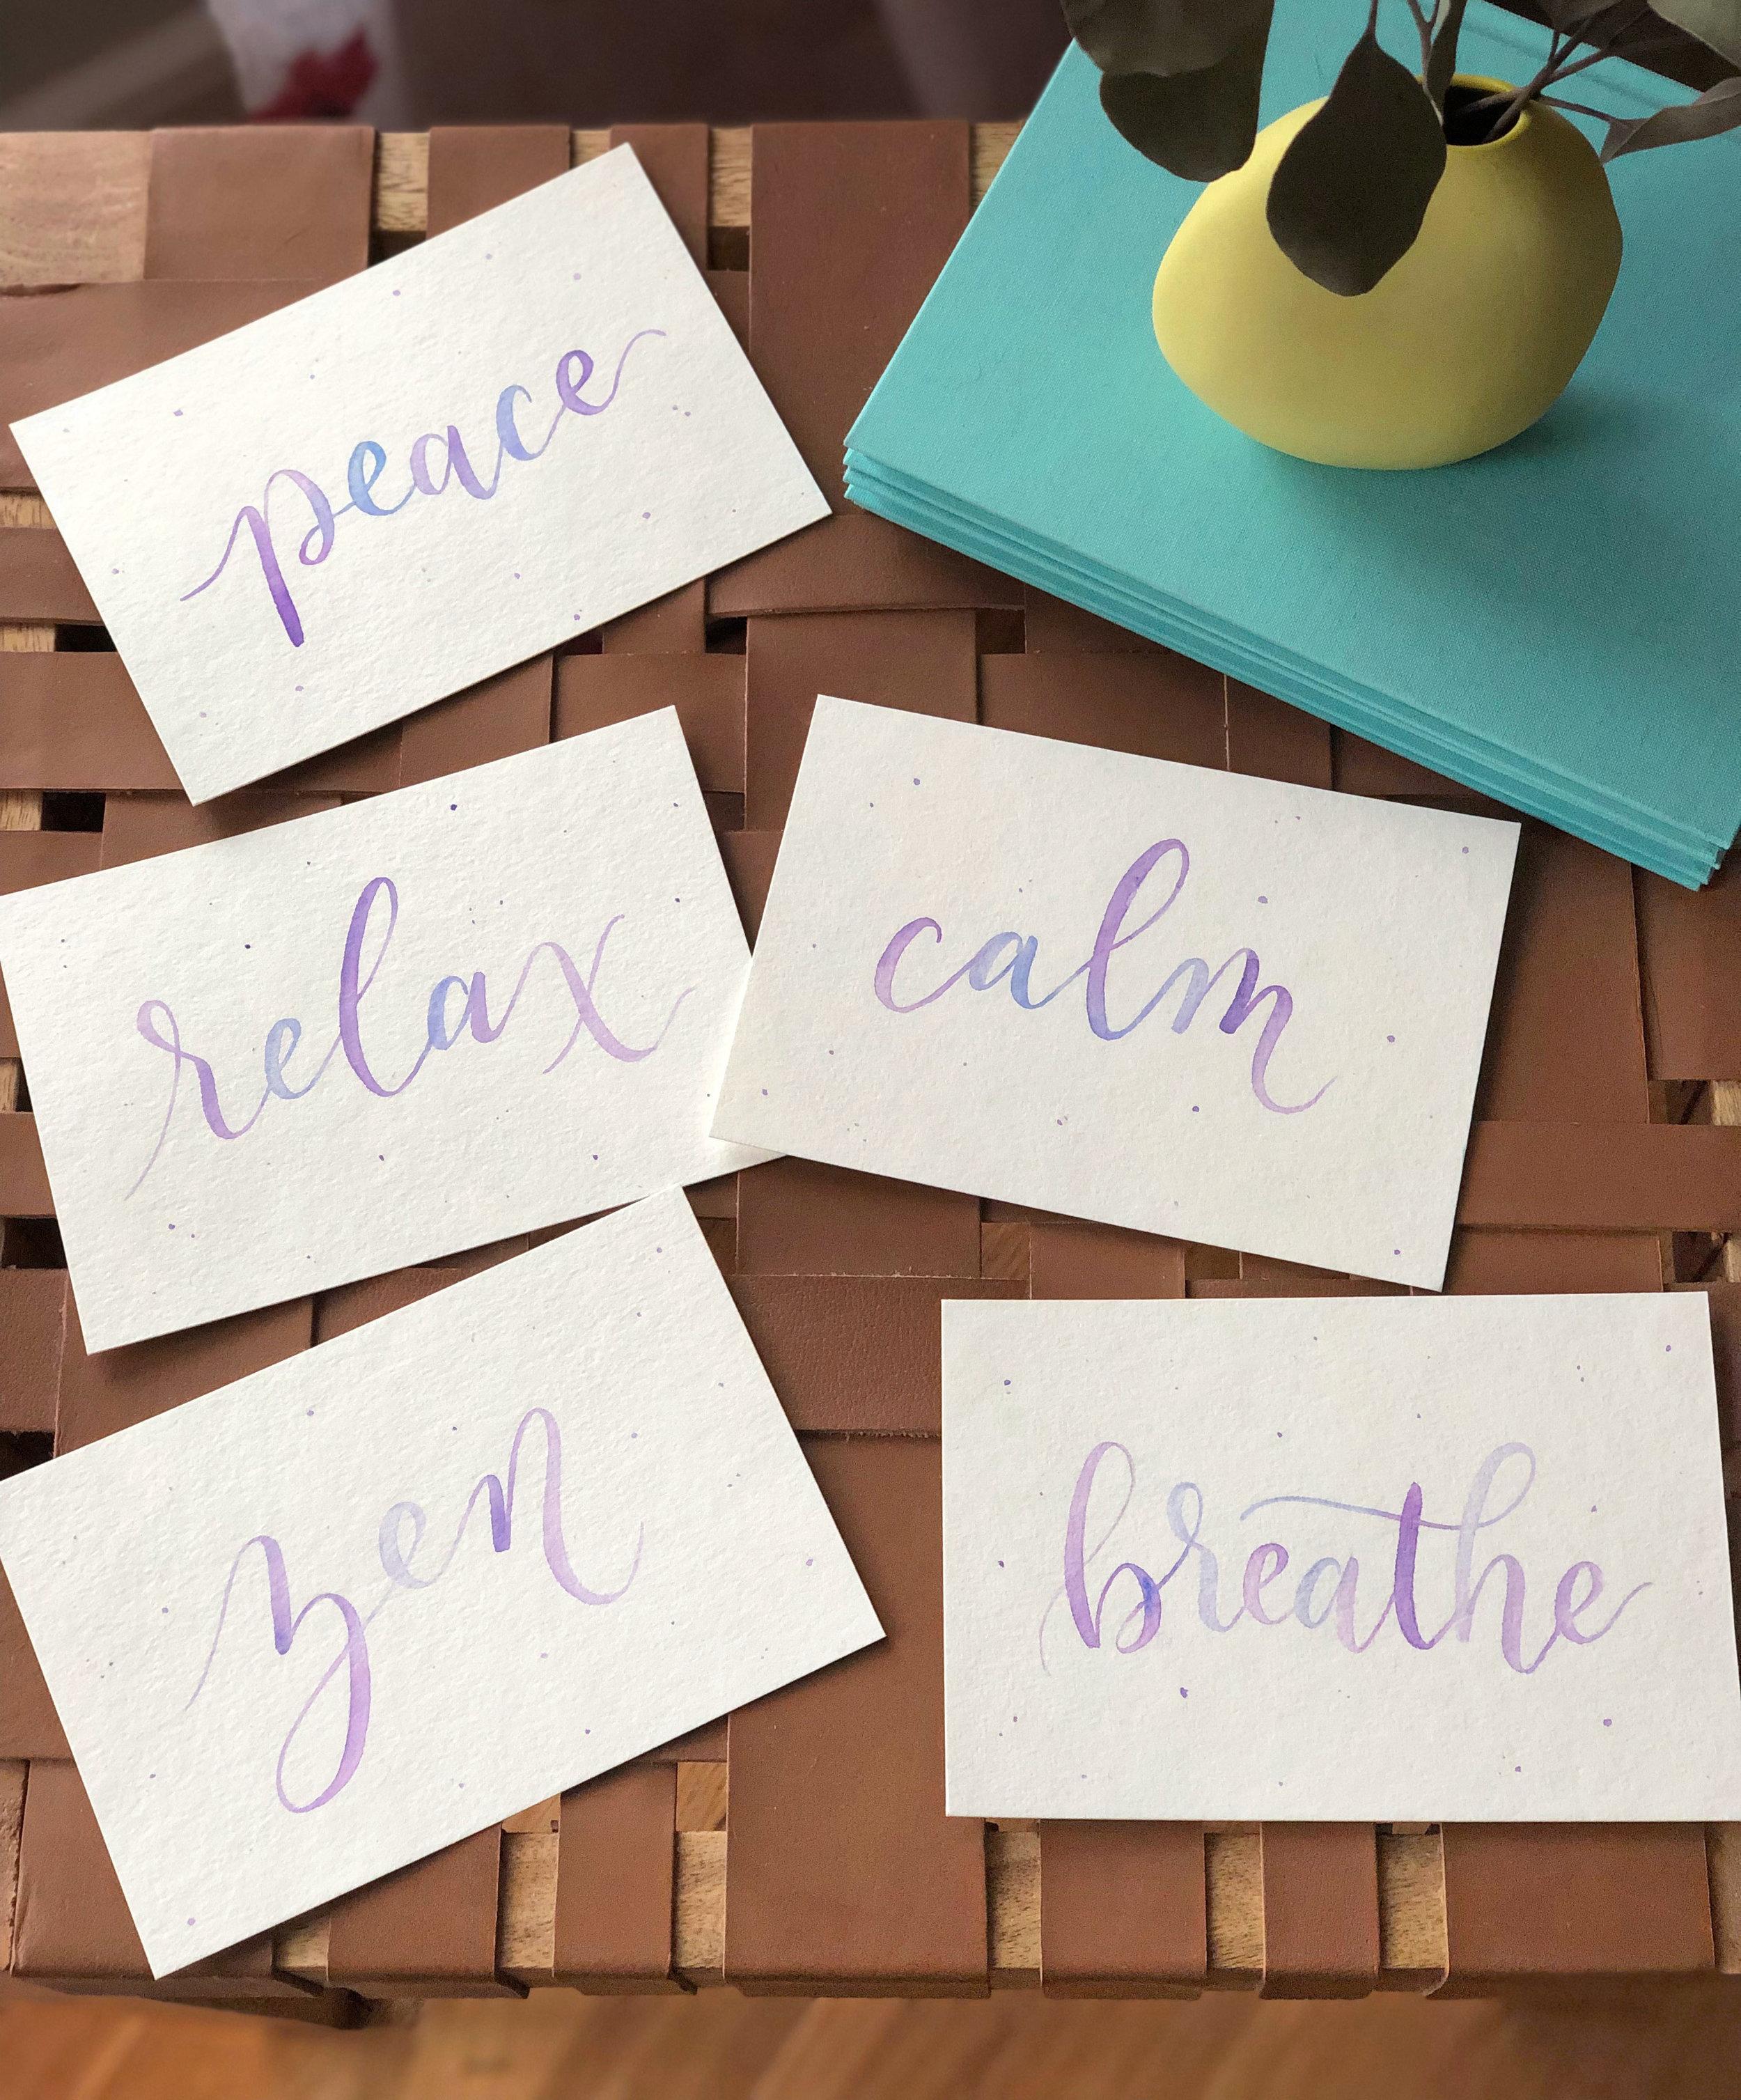 meditation-inspiration-watercolor-lettering.jpg